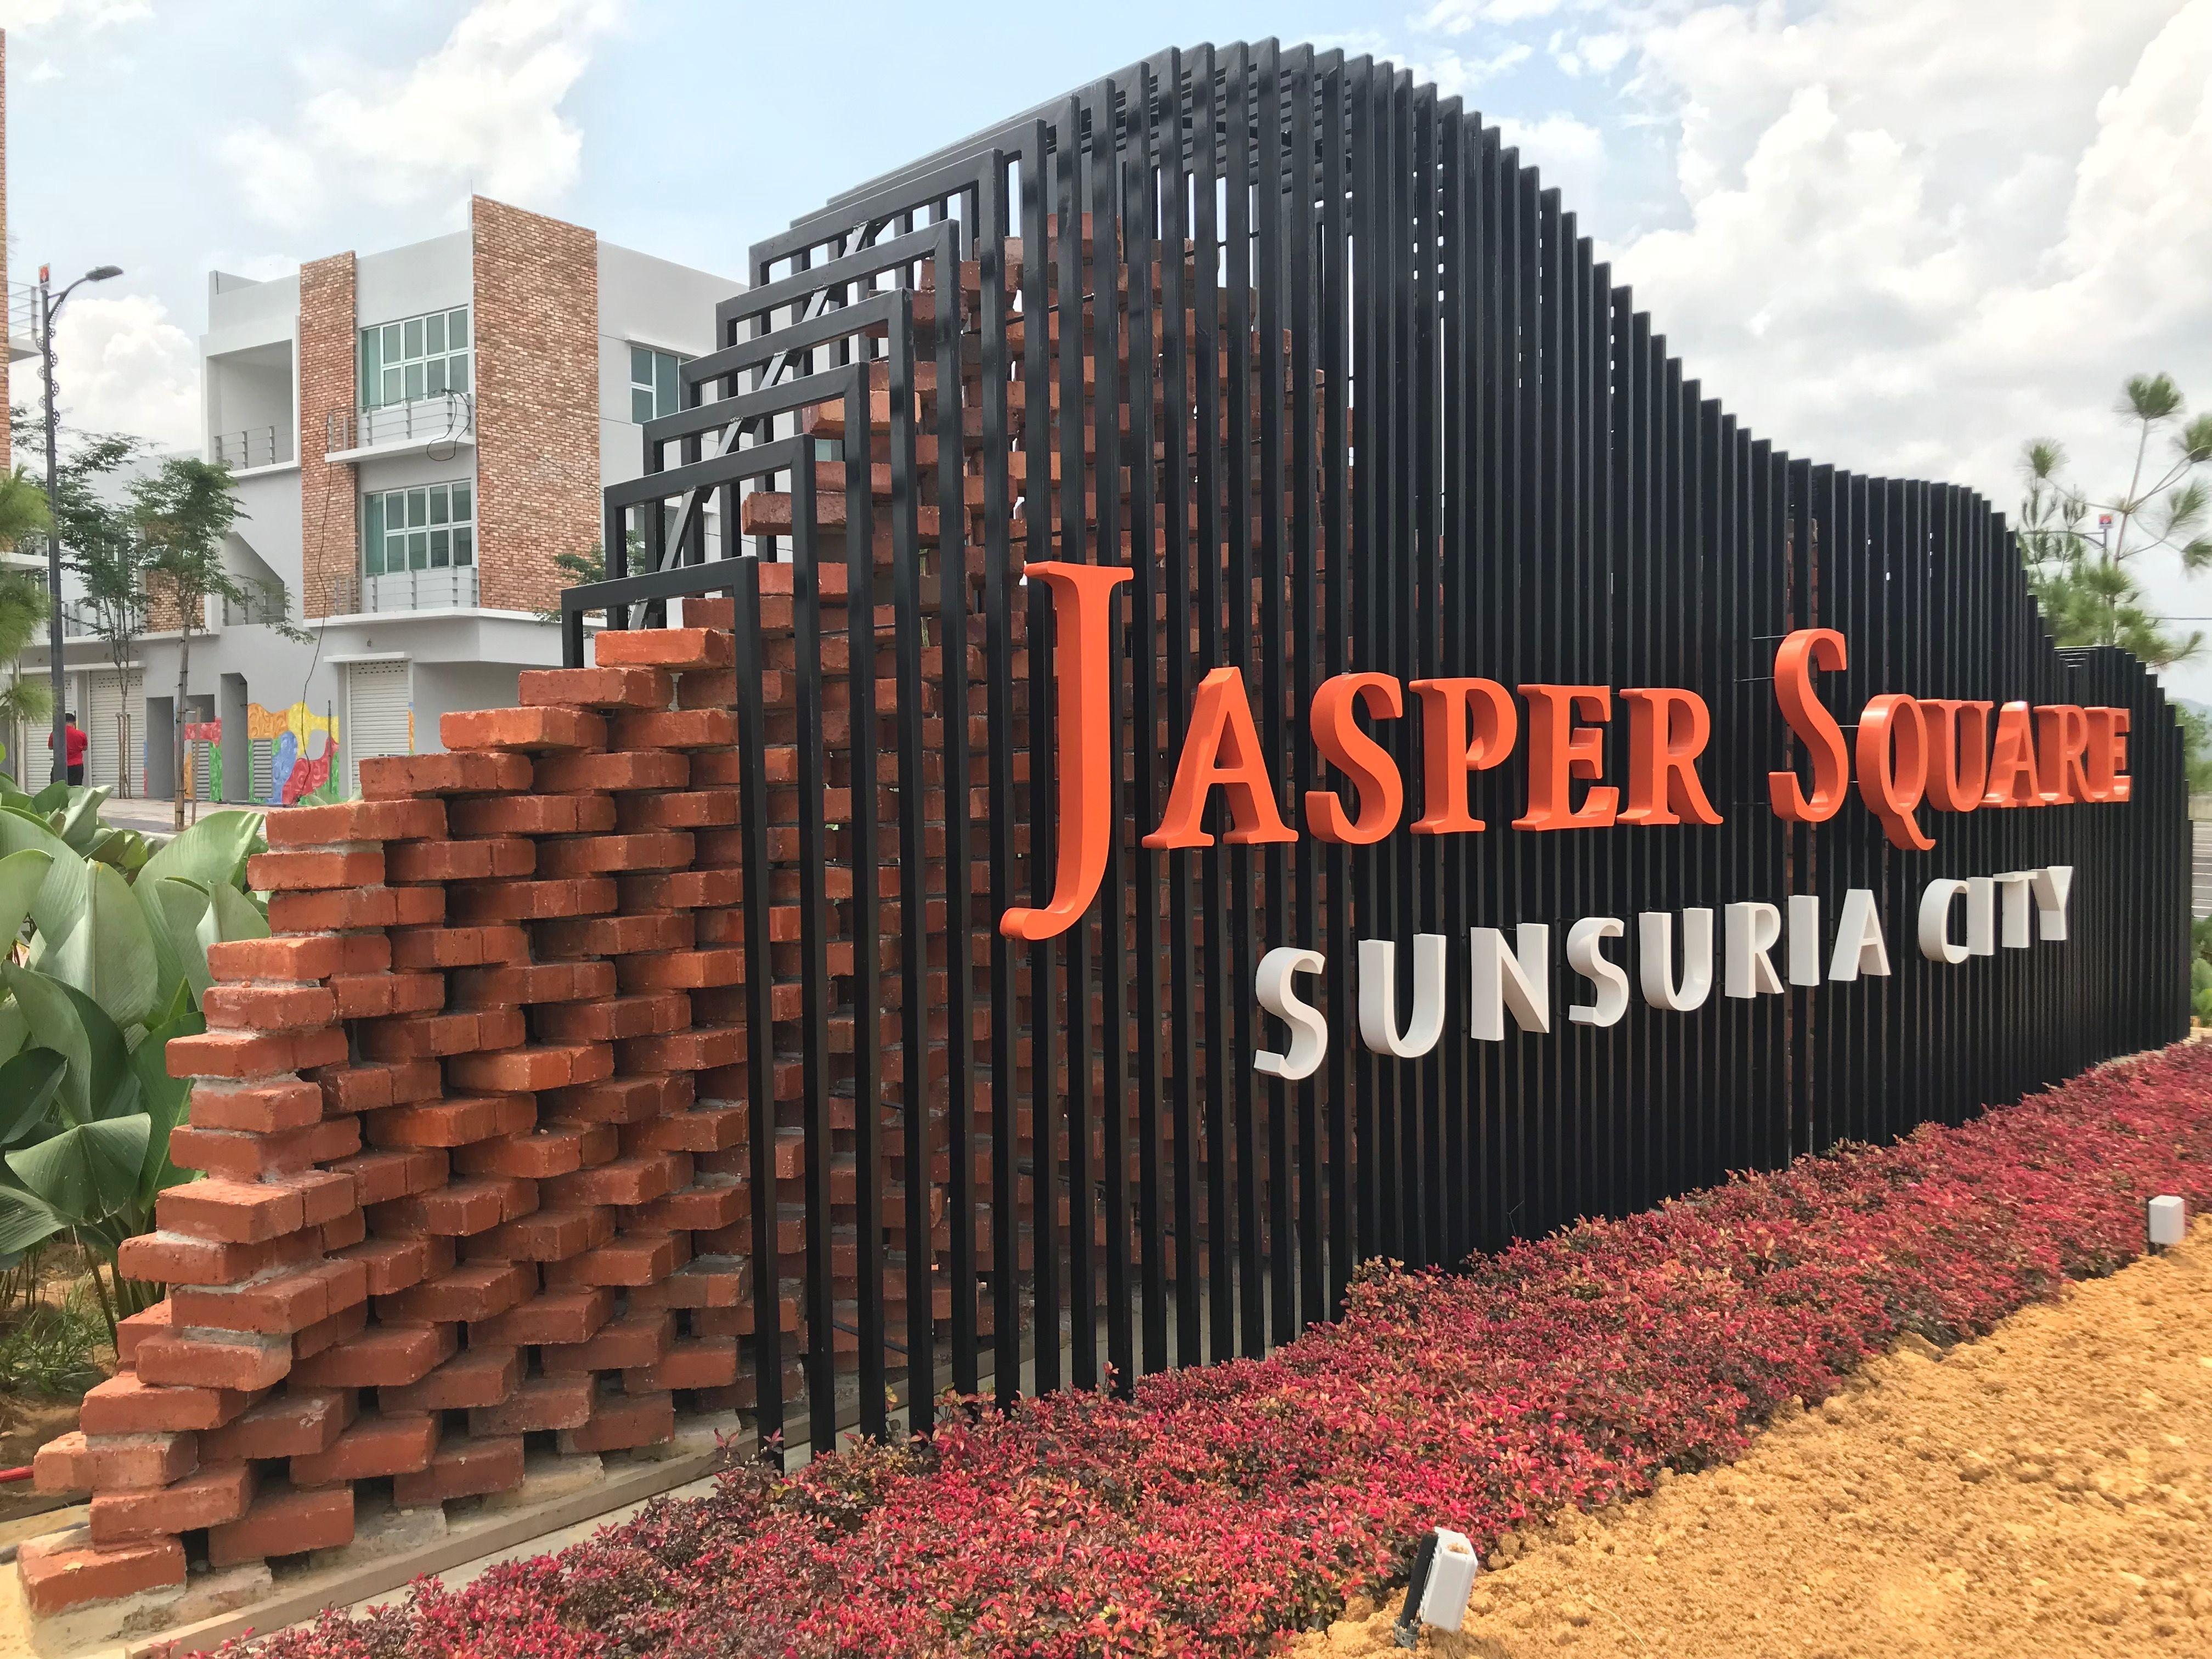 Those Bricks Signage Are Caged In Jasper Square Sunsuria City